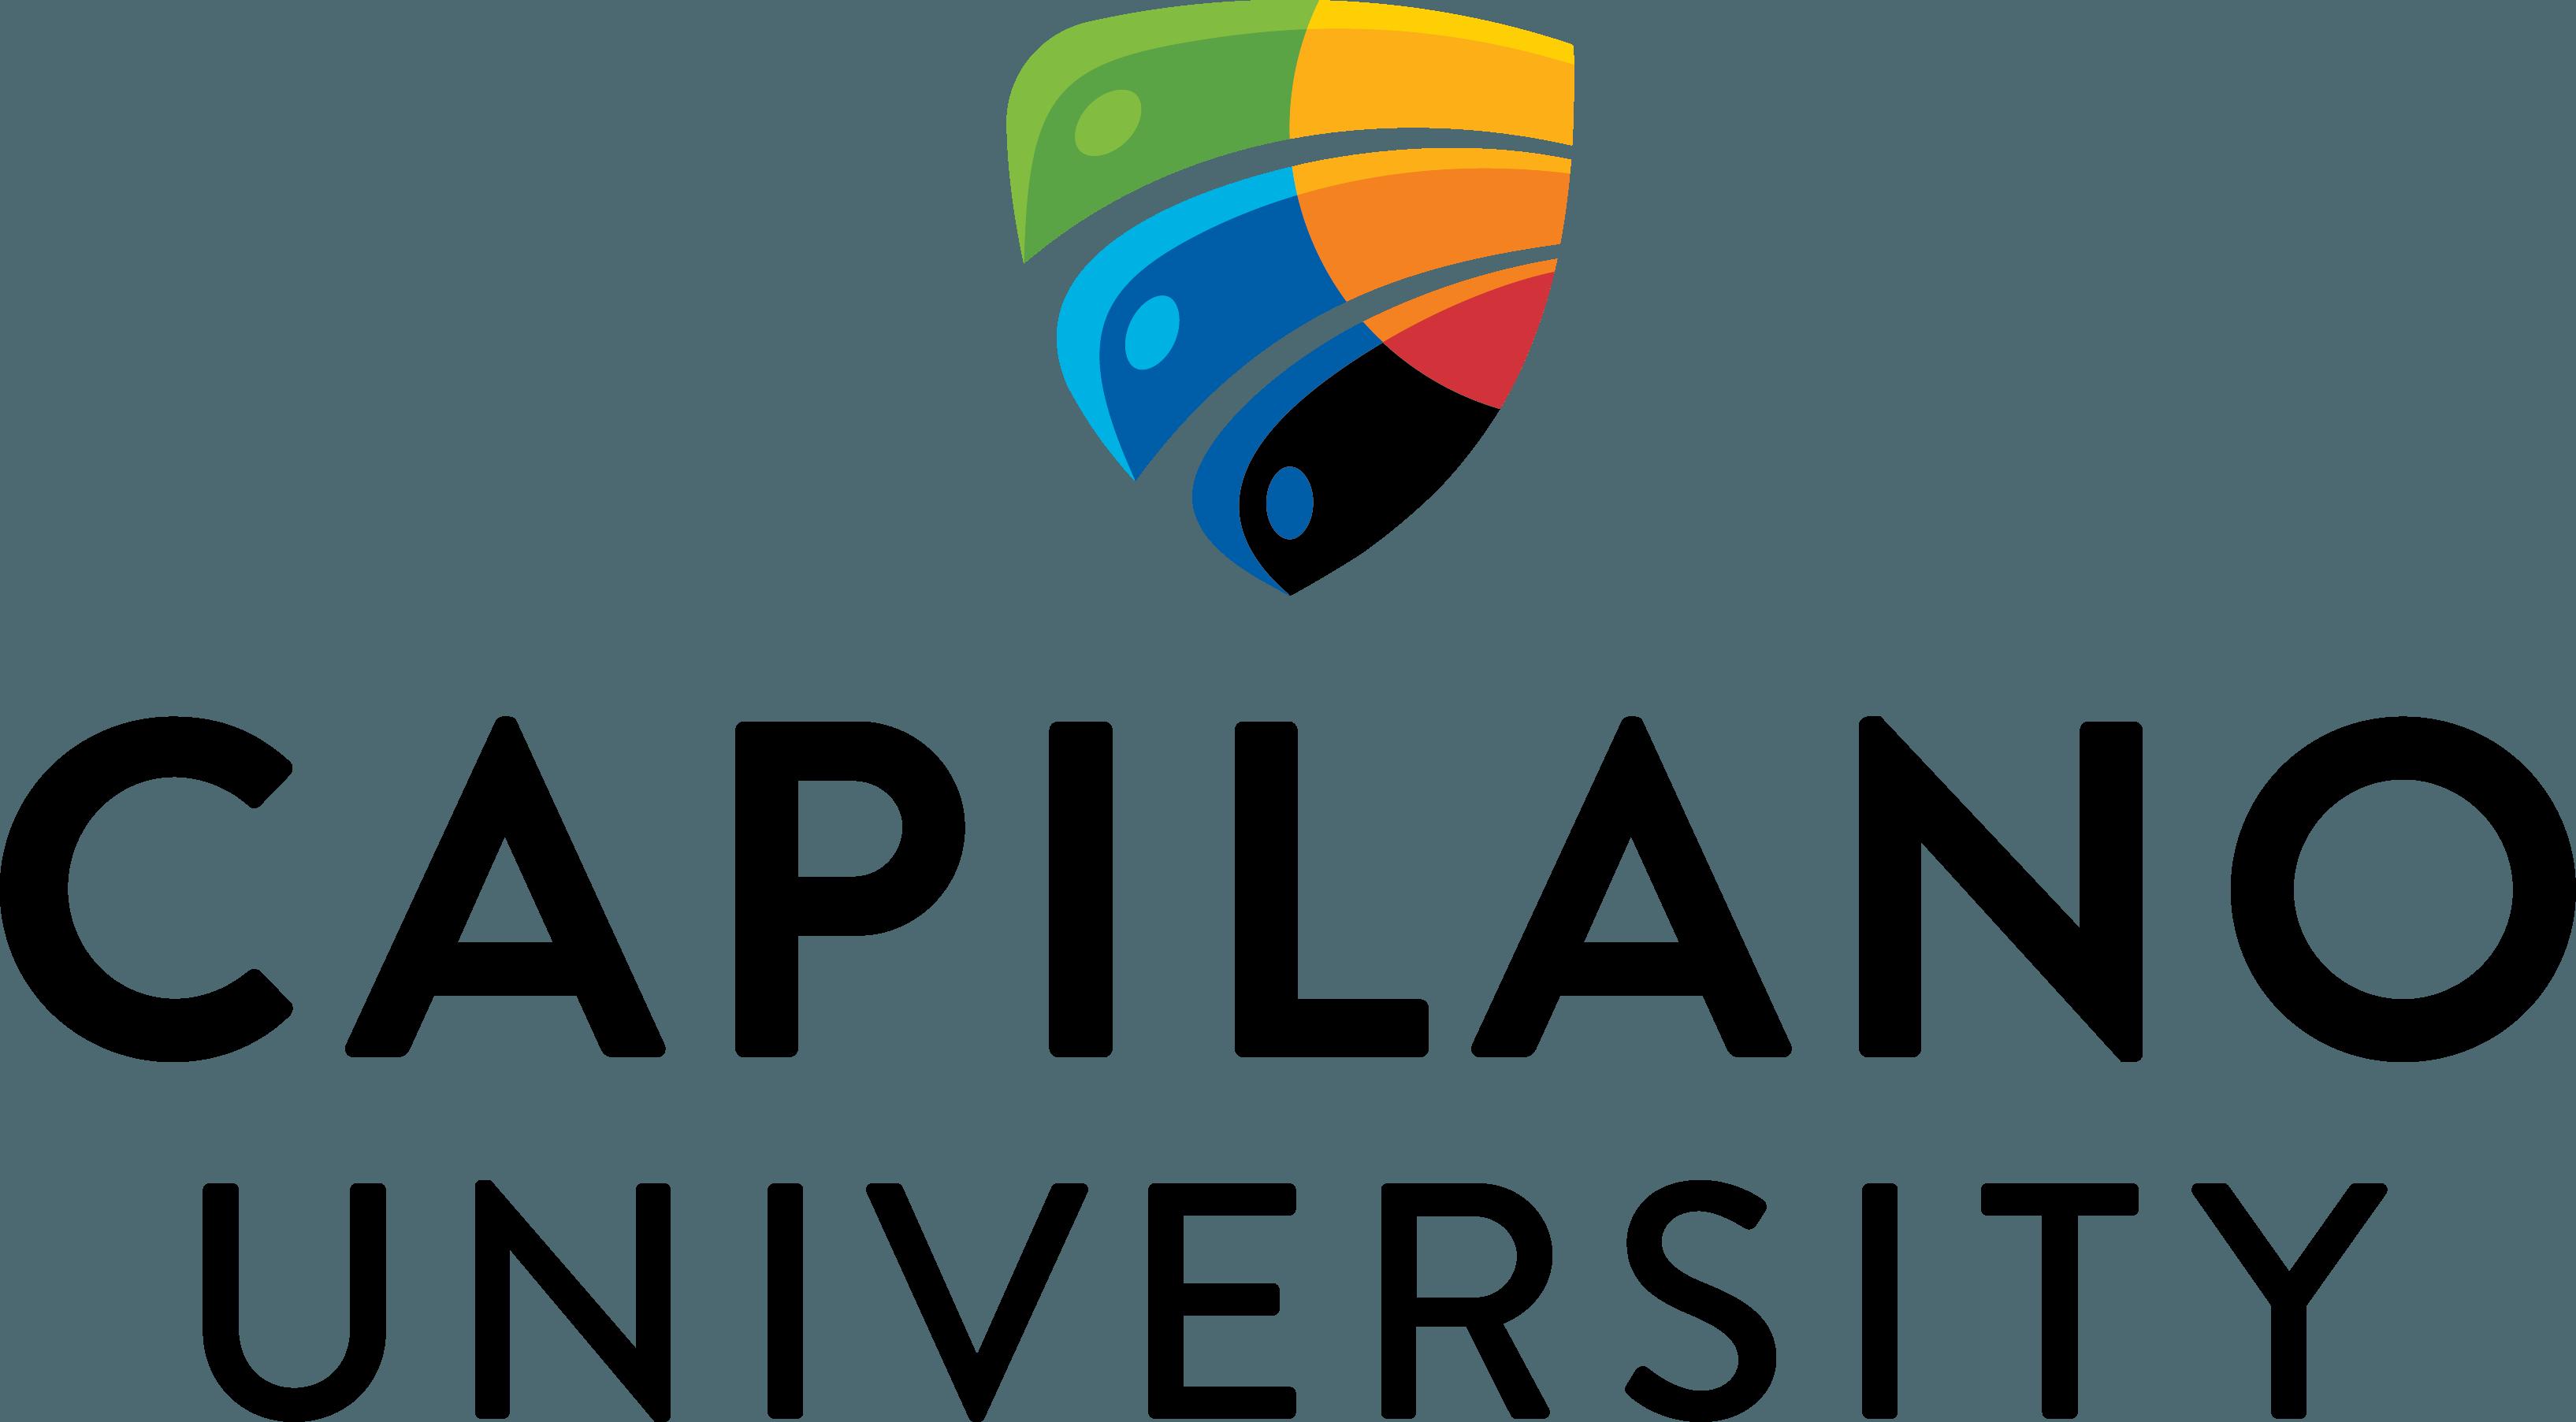 The rebranded Capilano University logo (Capilano University)